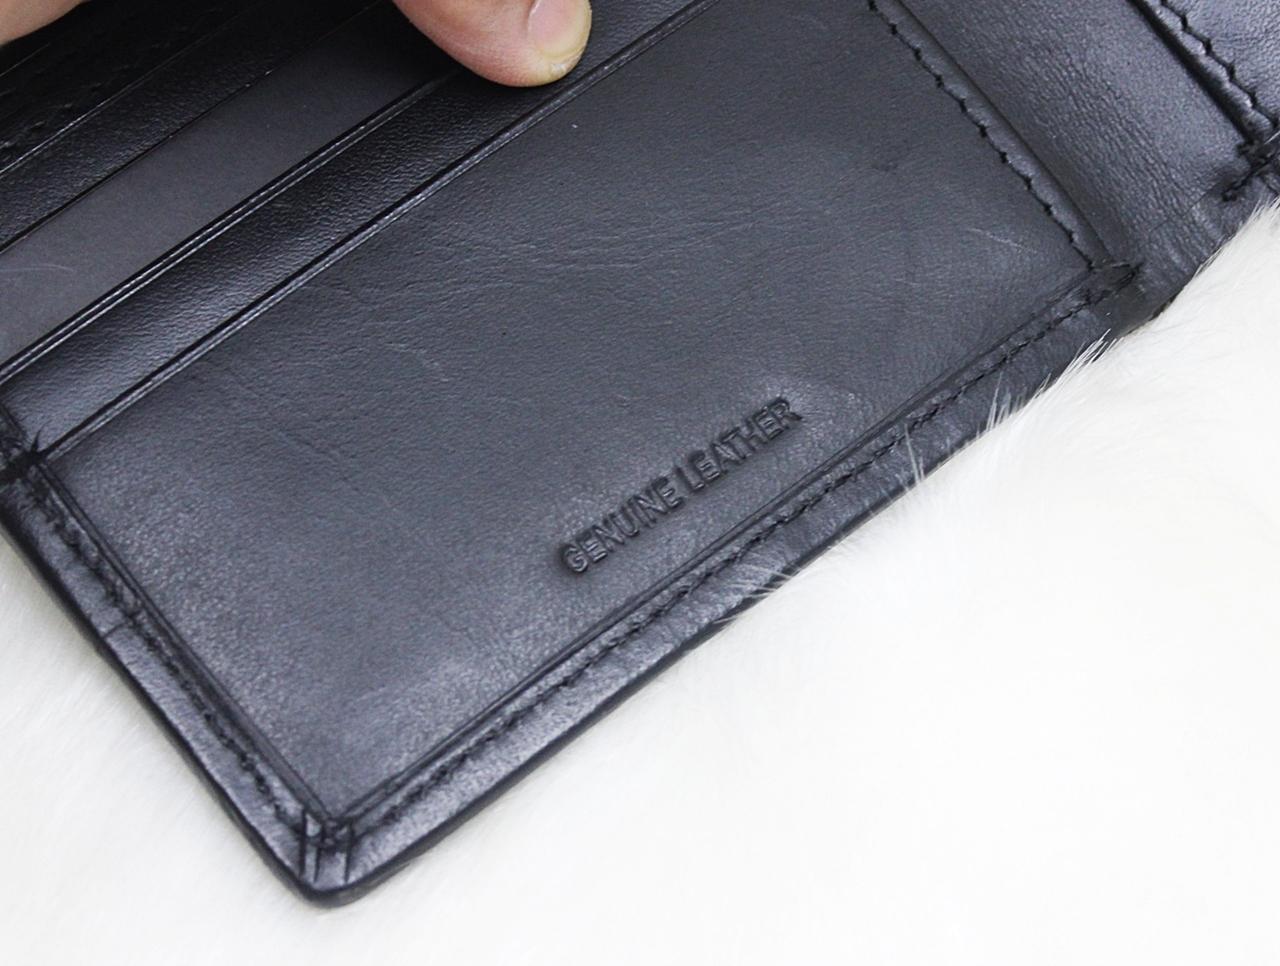 Guess Lee Stitching Men Wallet Black